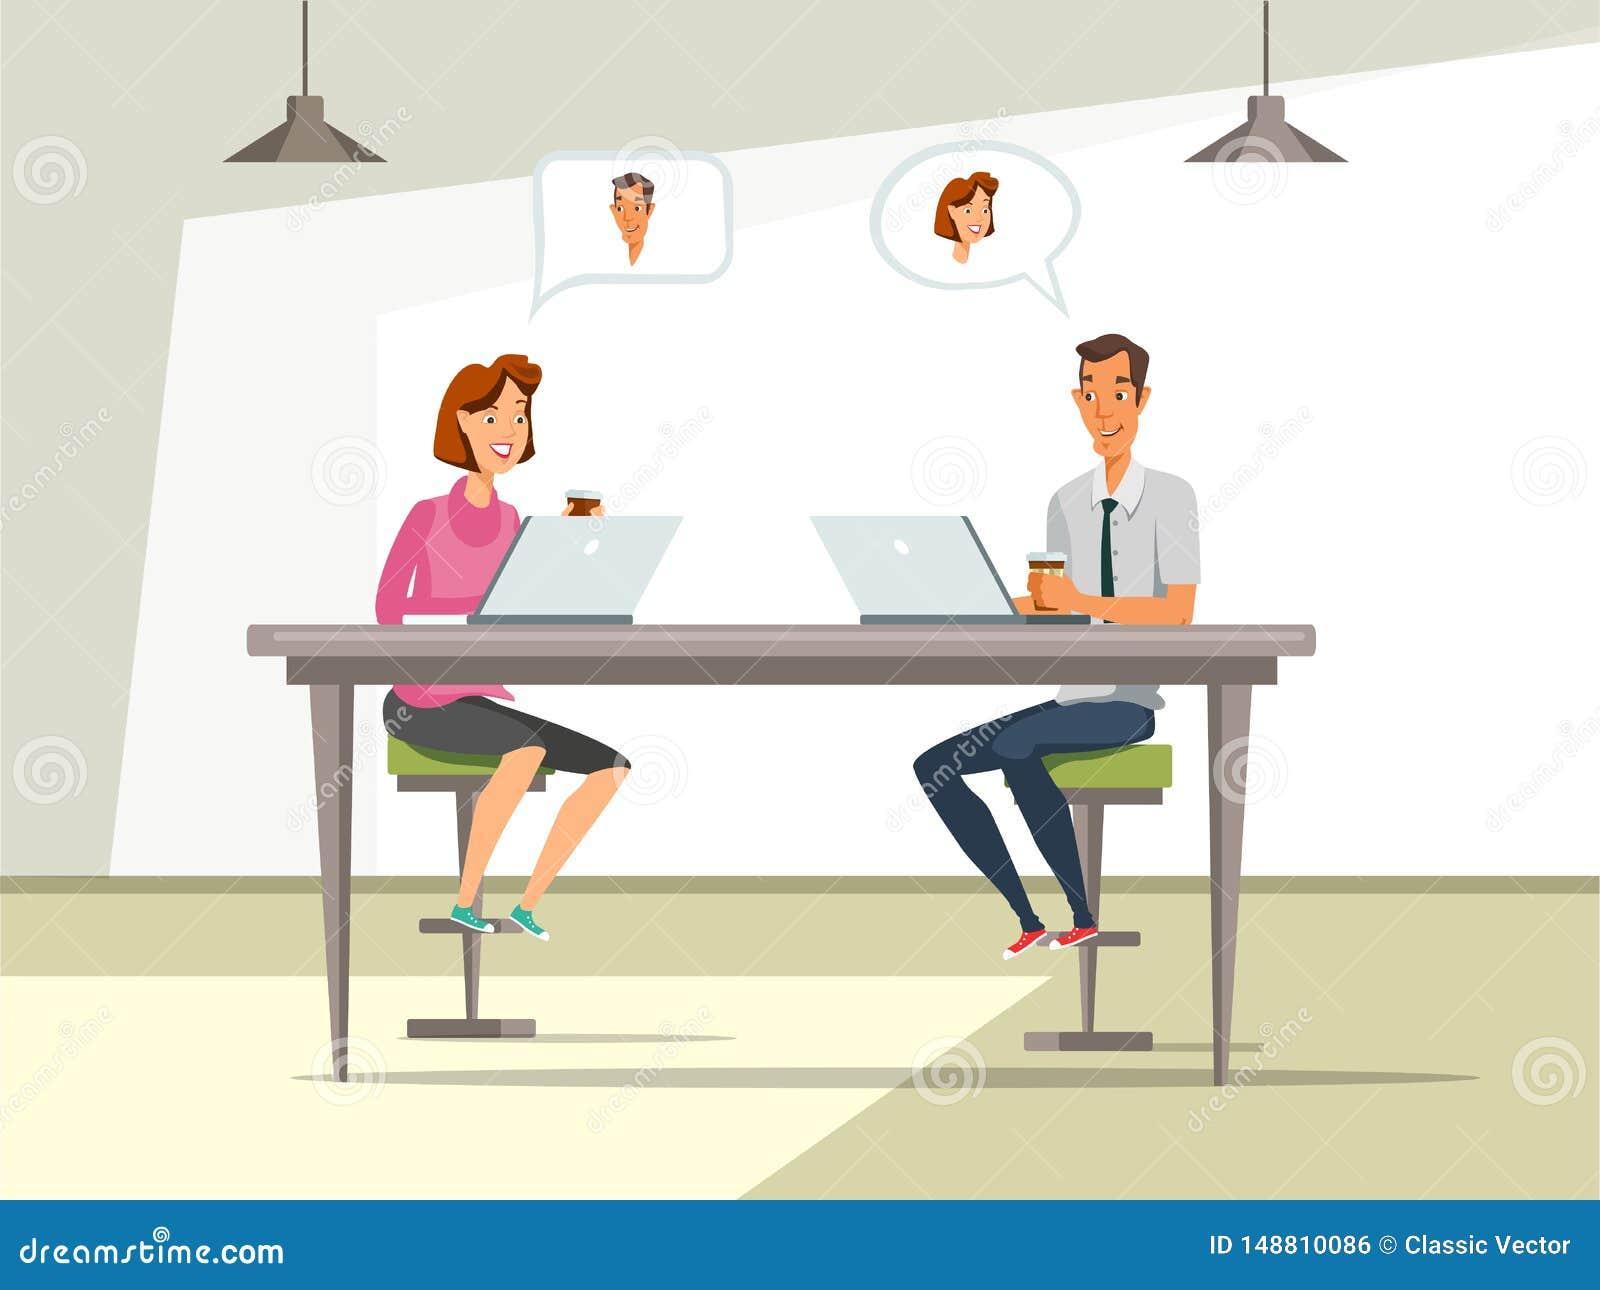 Man and woman at job interview vector illustration